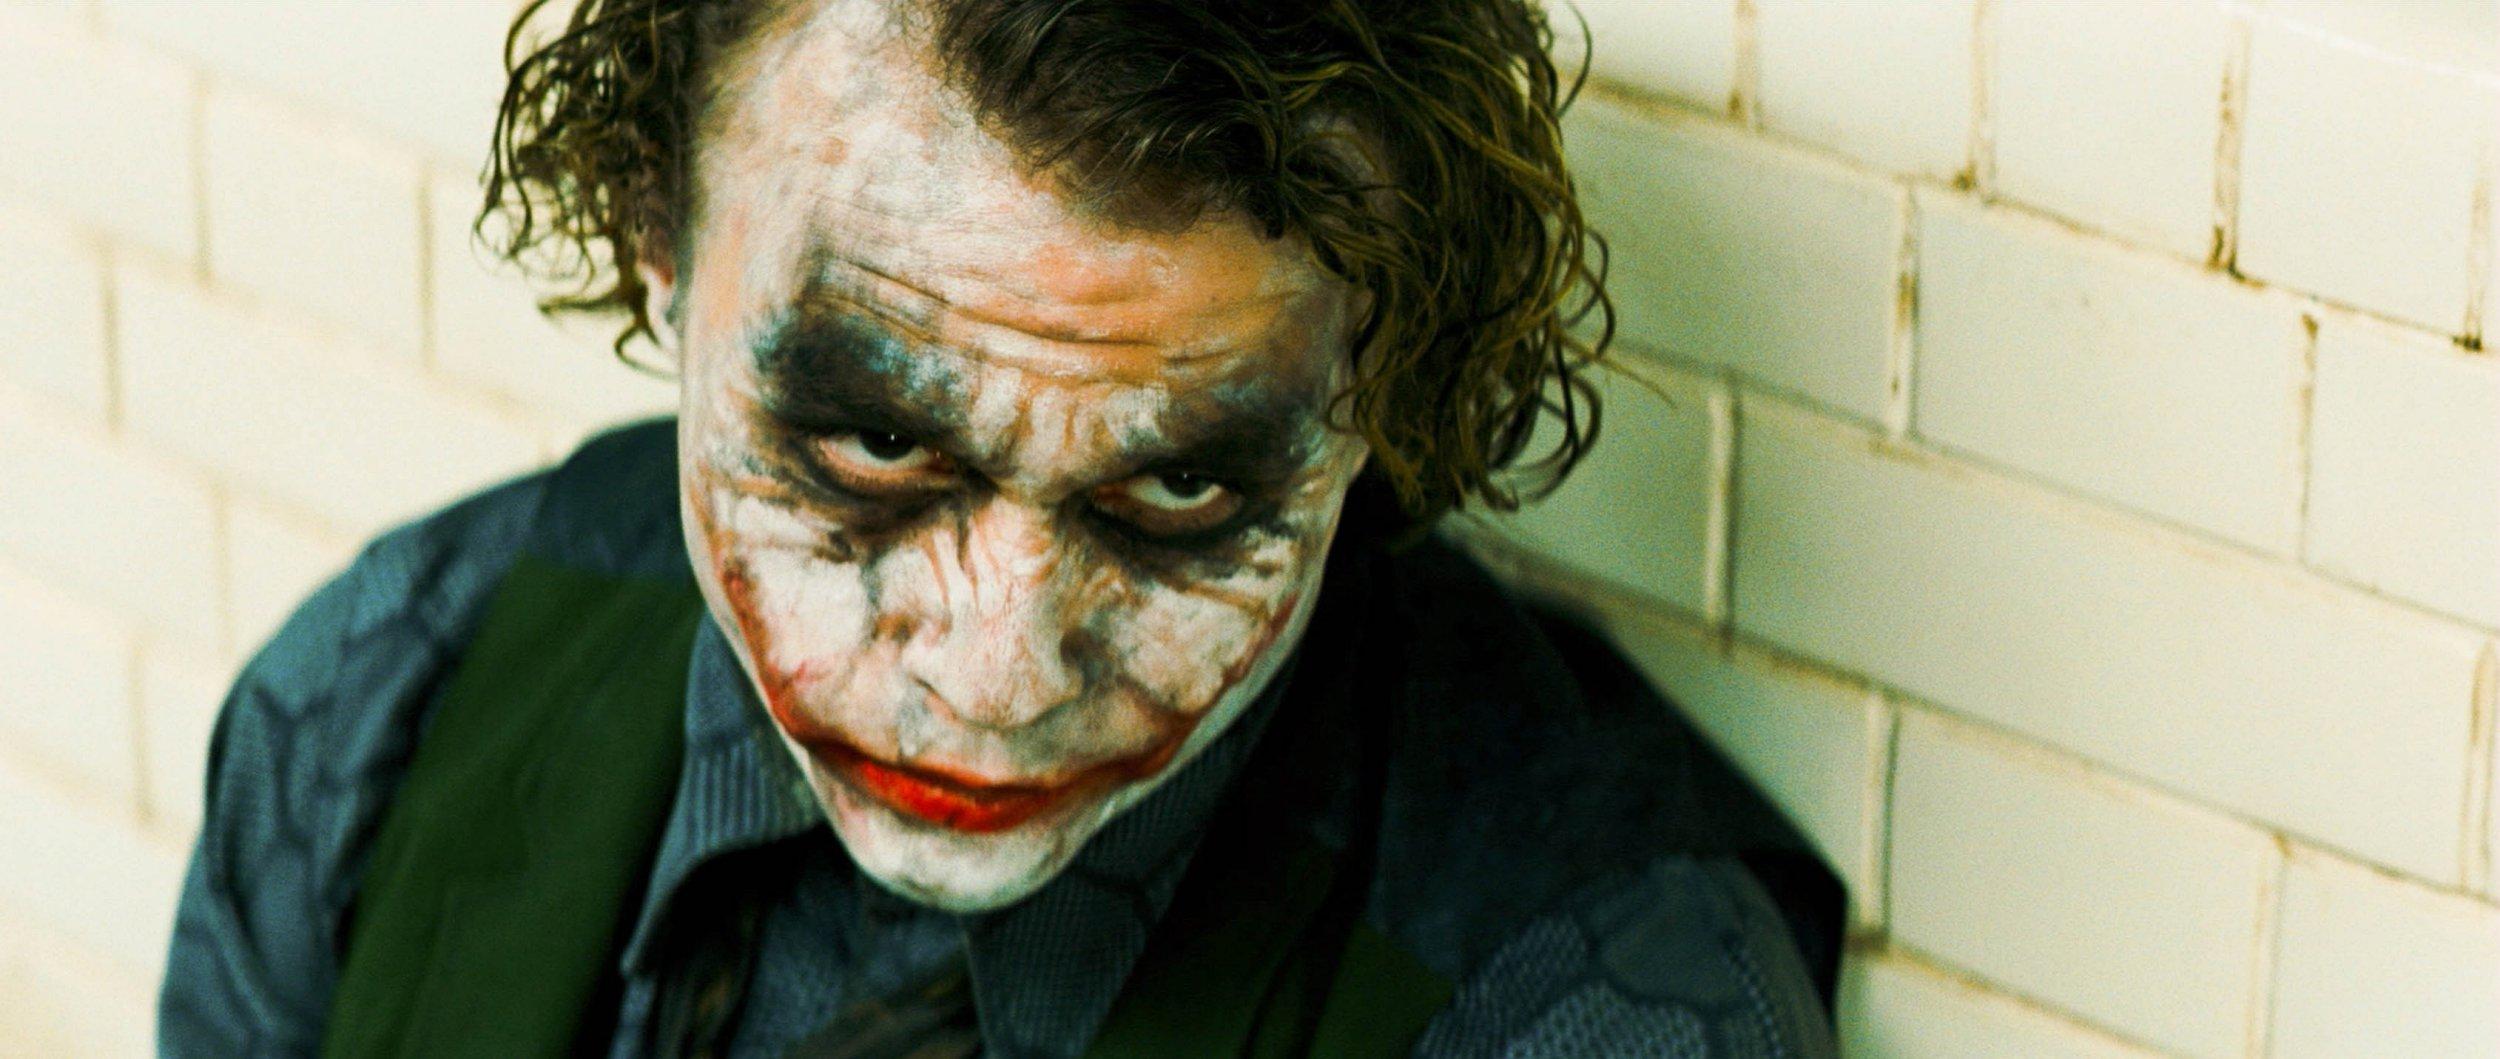 Patton Oswalt unearths Dark Knight theory about Heath Ledger's Joker origin